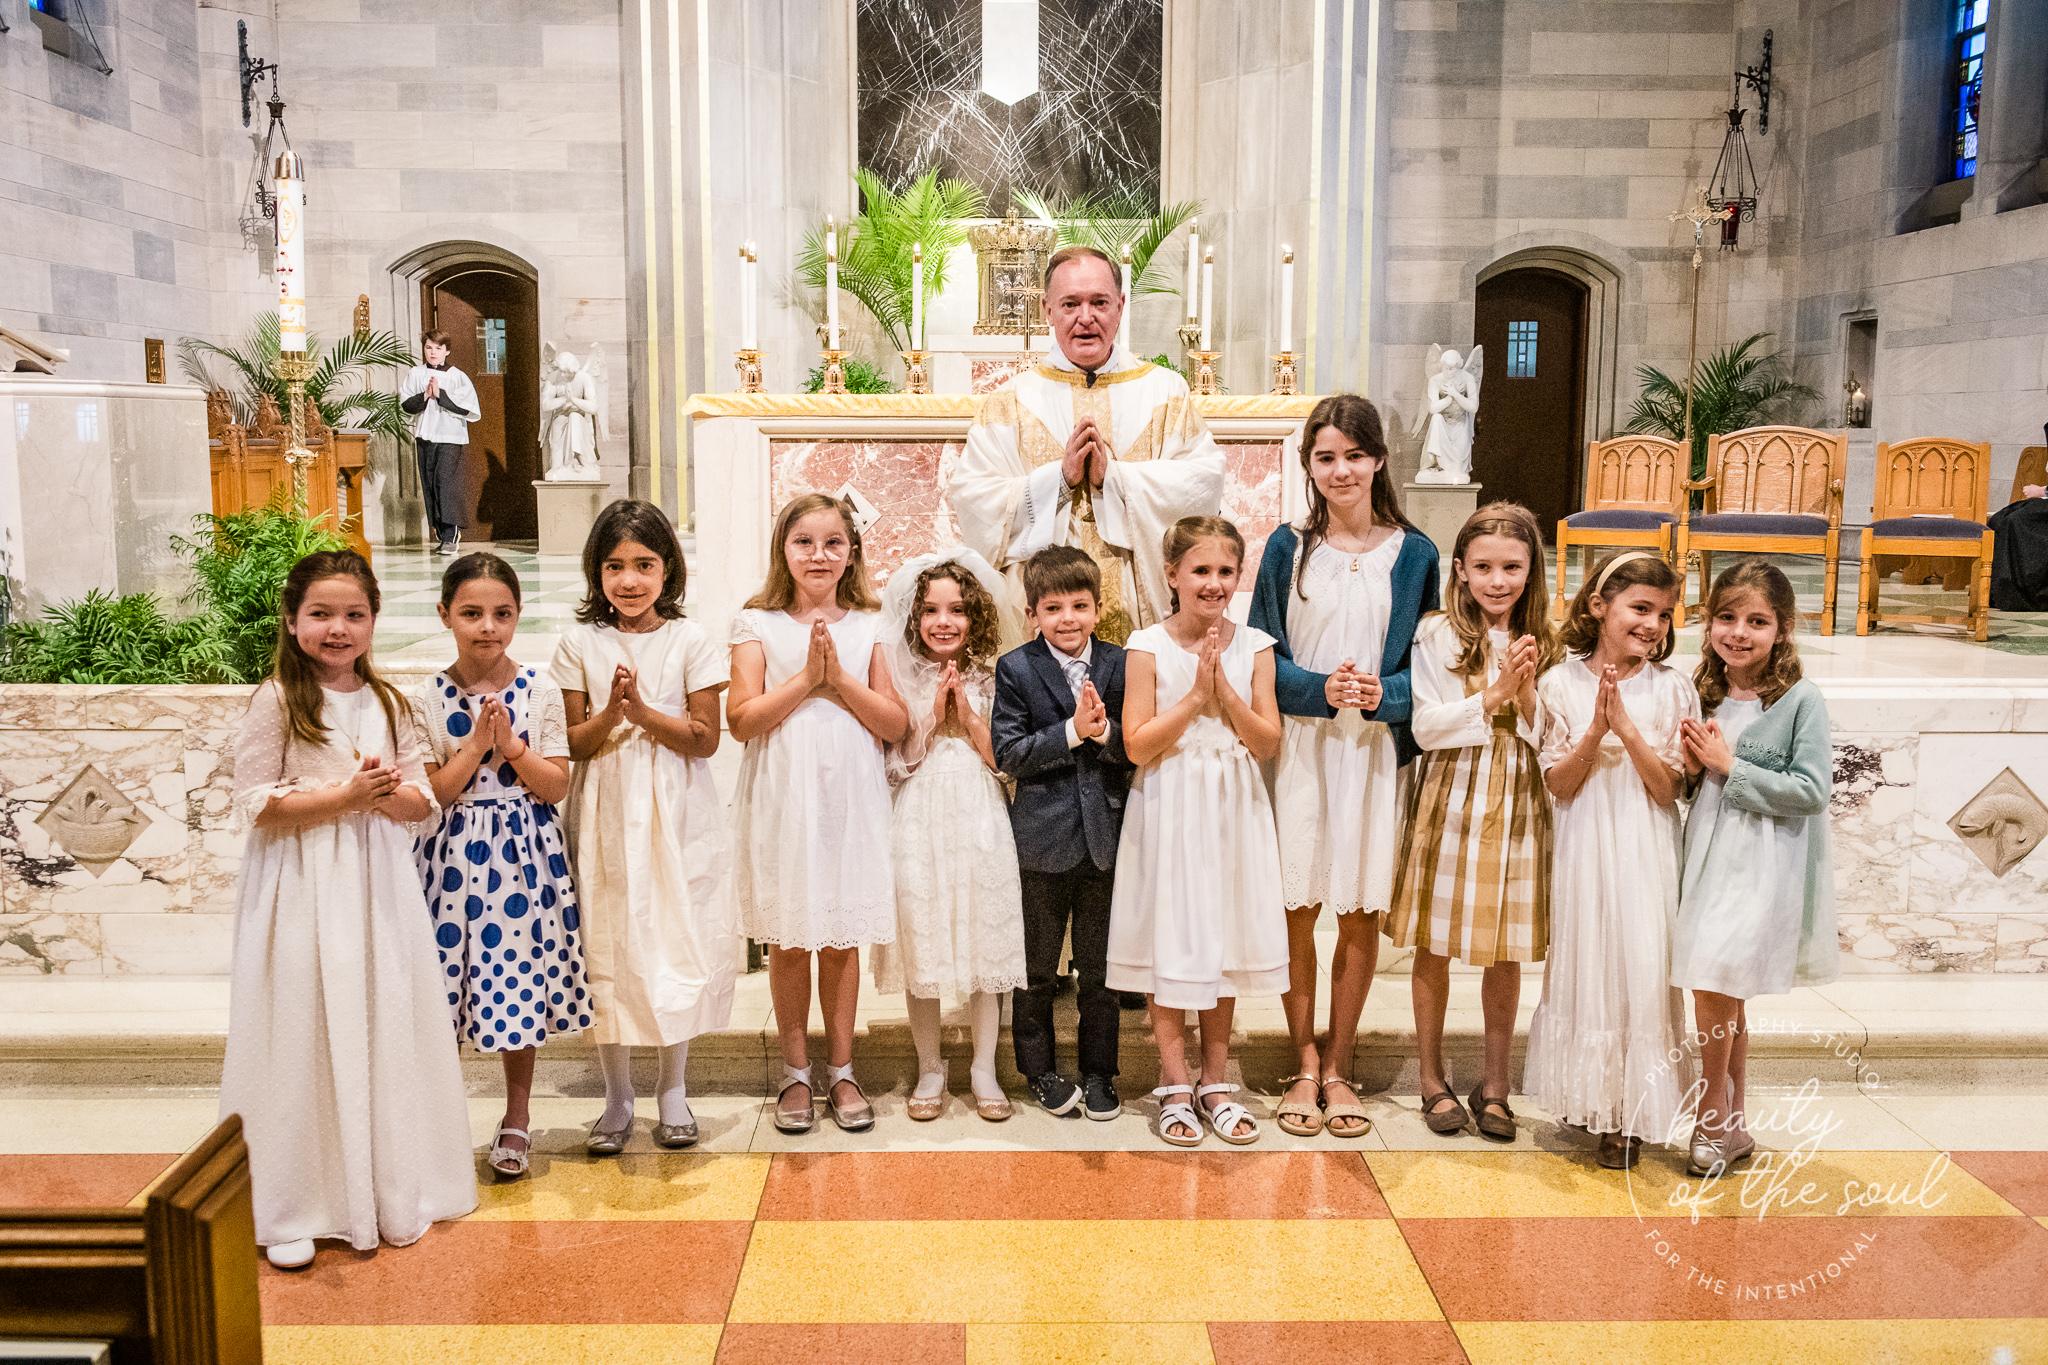 washington-dc-st-ann-catholic-church-first-holy-communion-beauty-of-the-soul-studio-may-2019-22.jpg